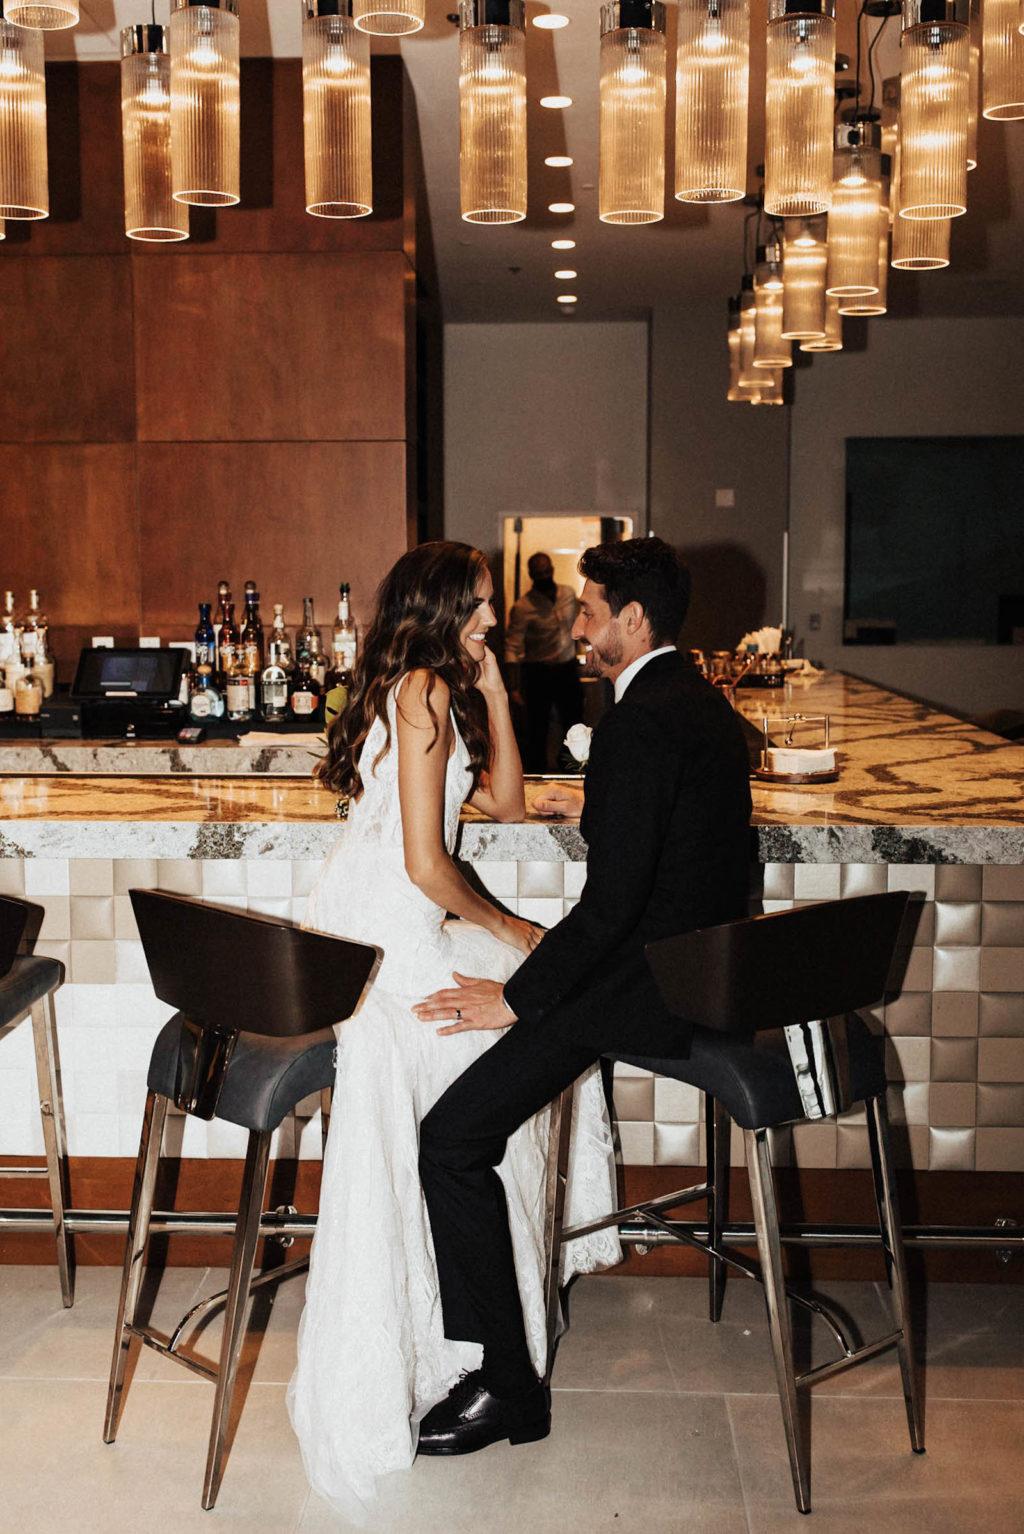 Bride and Groom Hotel Lobby Wedding Portrait | Tampa Wedding Venue The Current Hotel